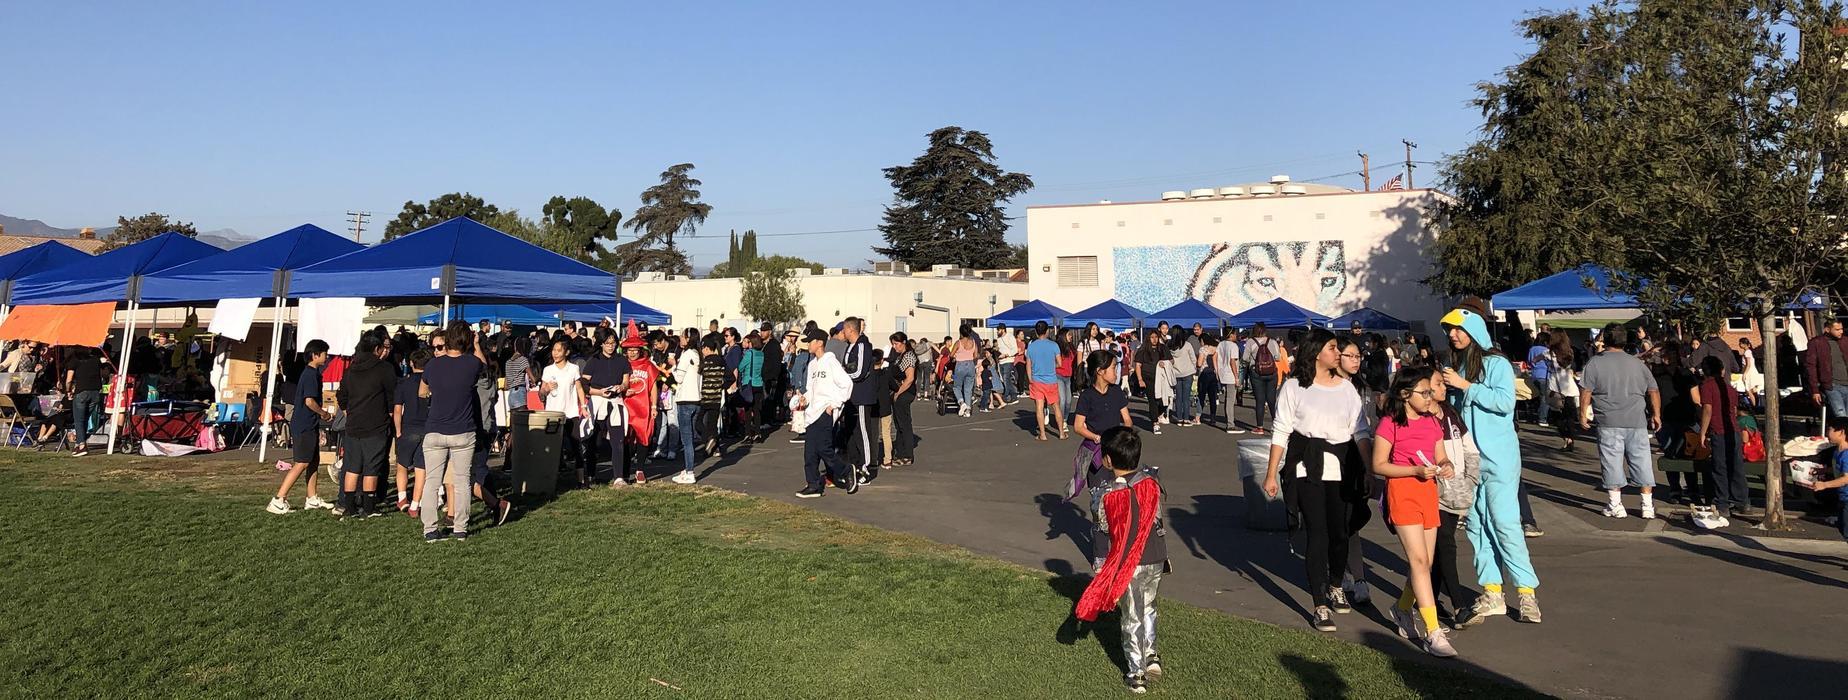 Marguerita School events